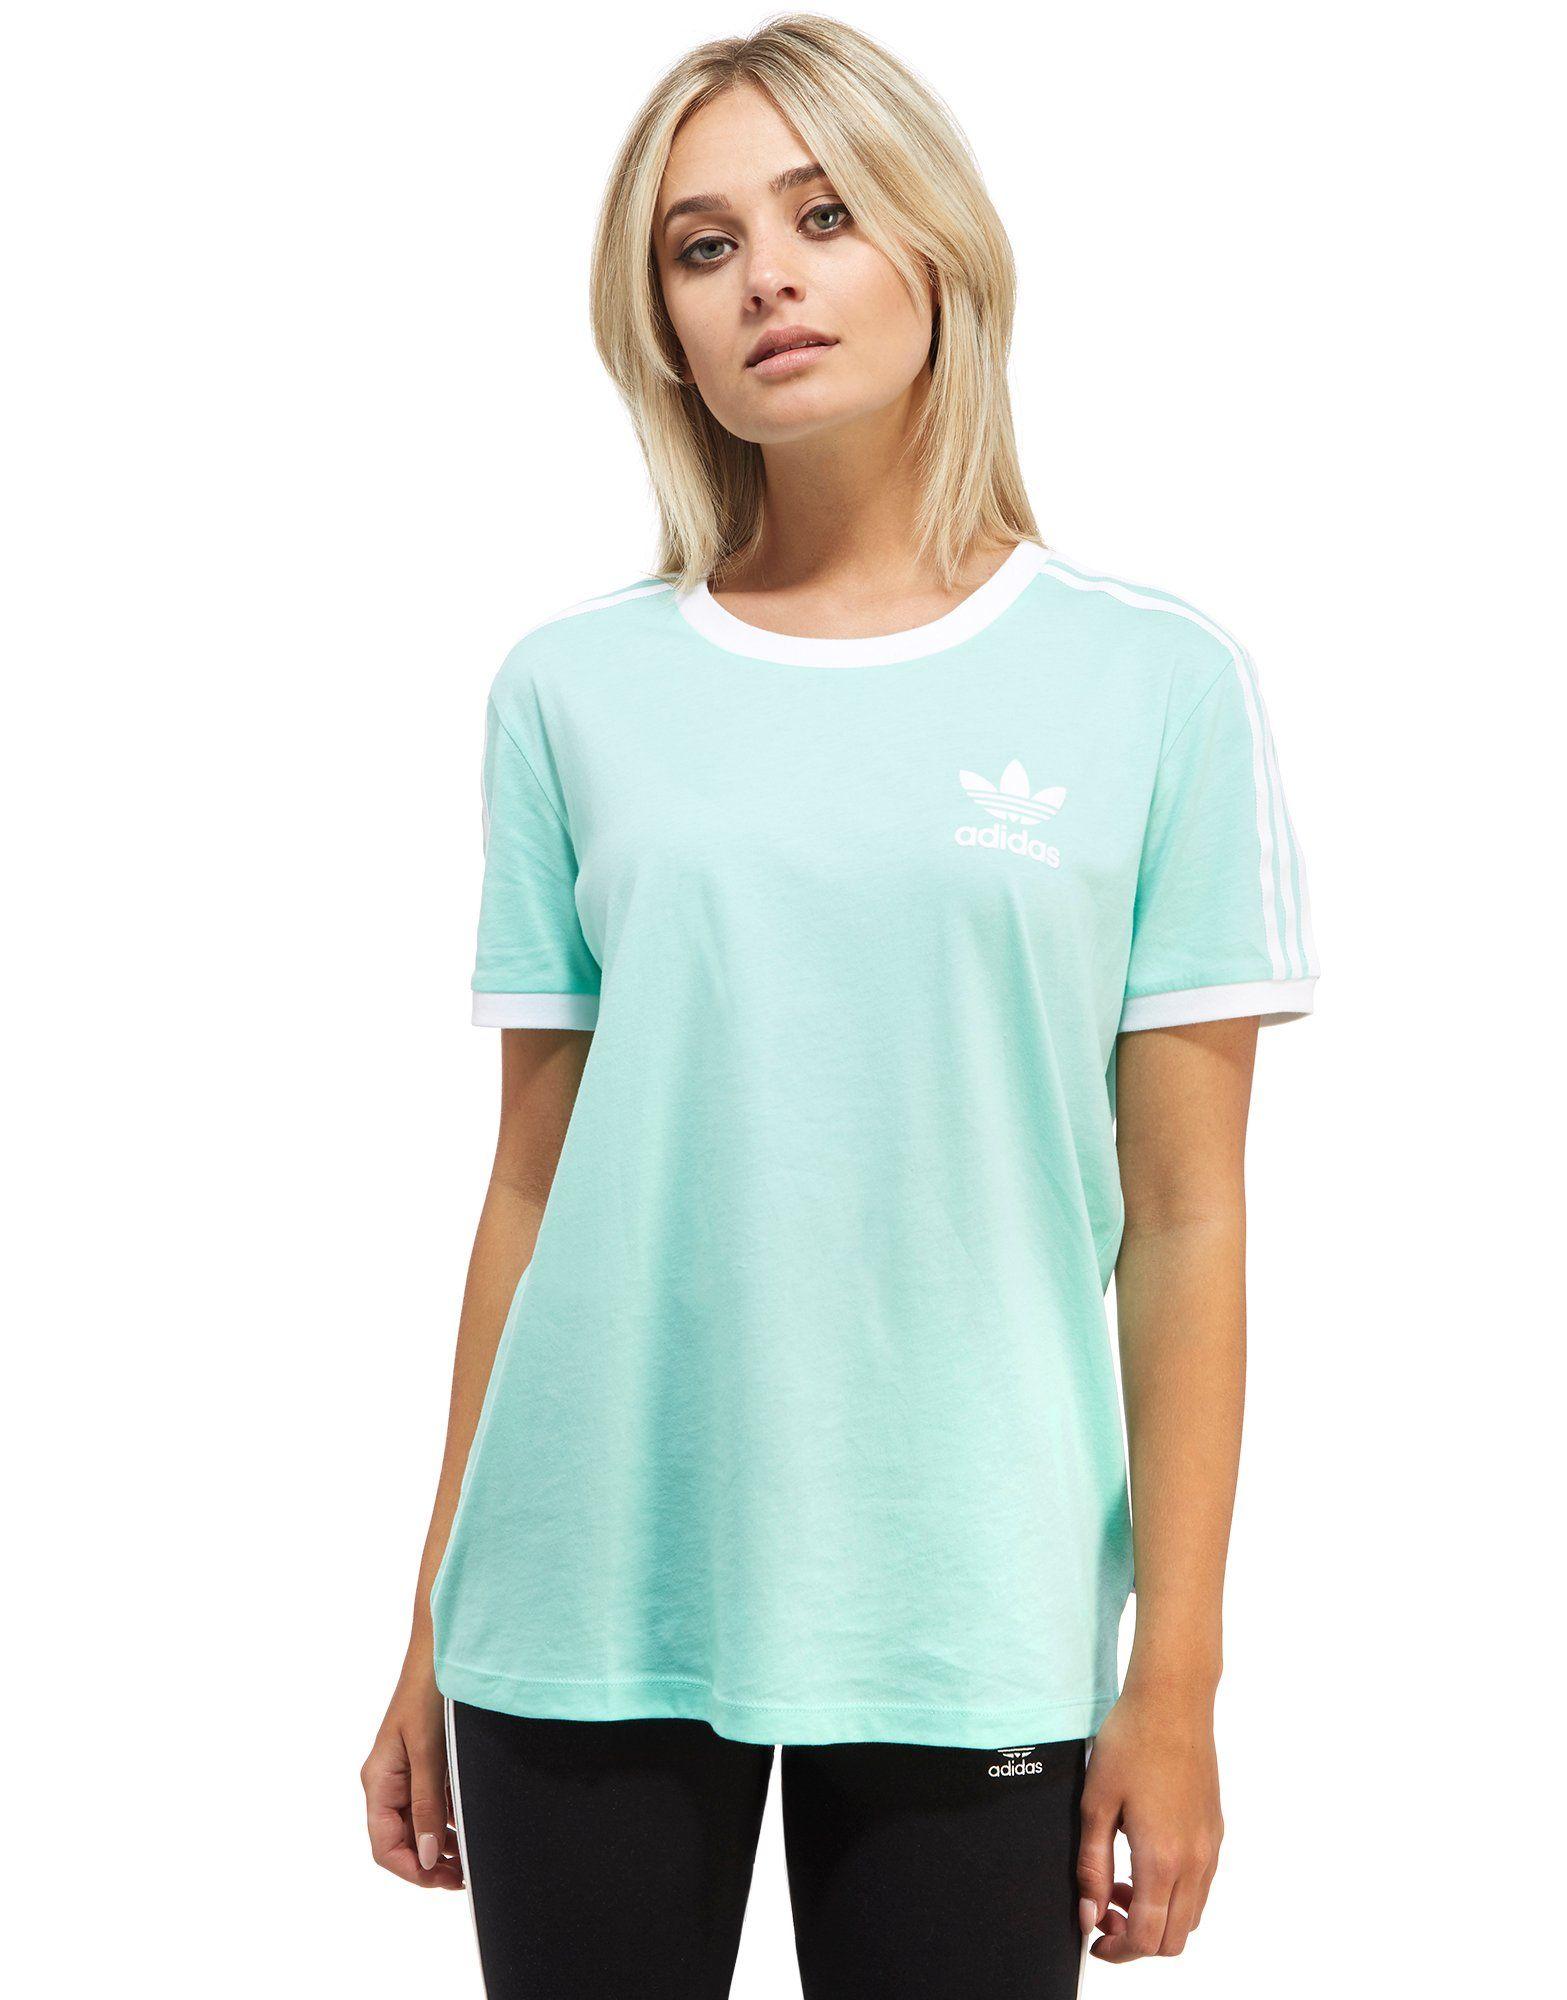 sale 100% genuine the cheapest Adidas California T Shirt Womens Green   Toffee Art